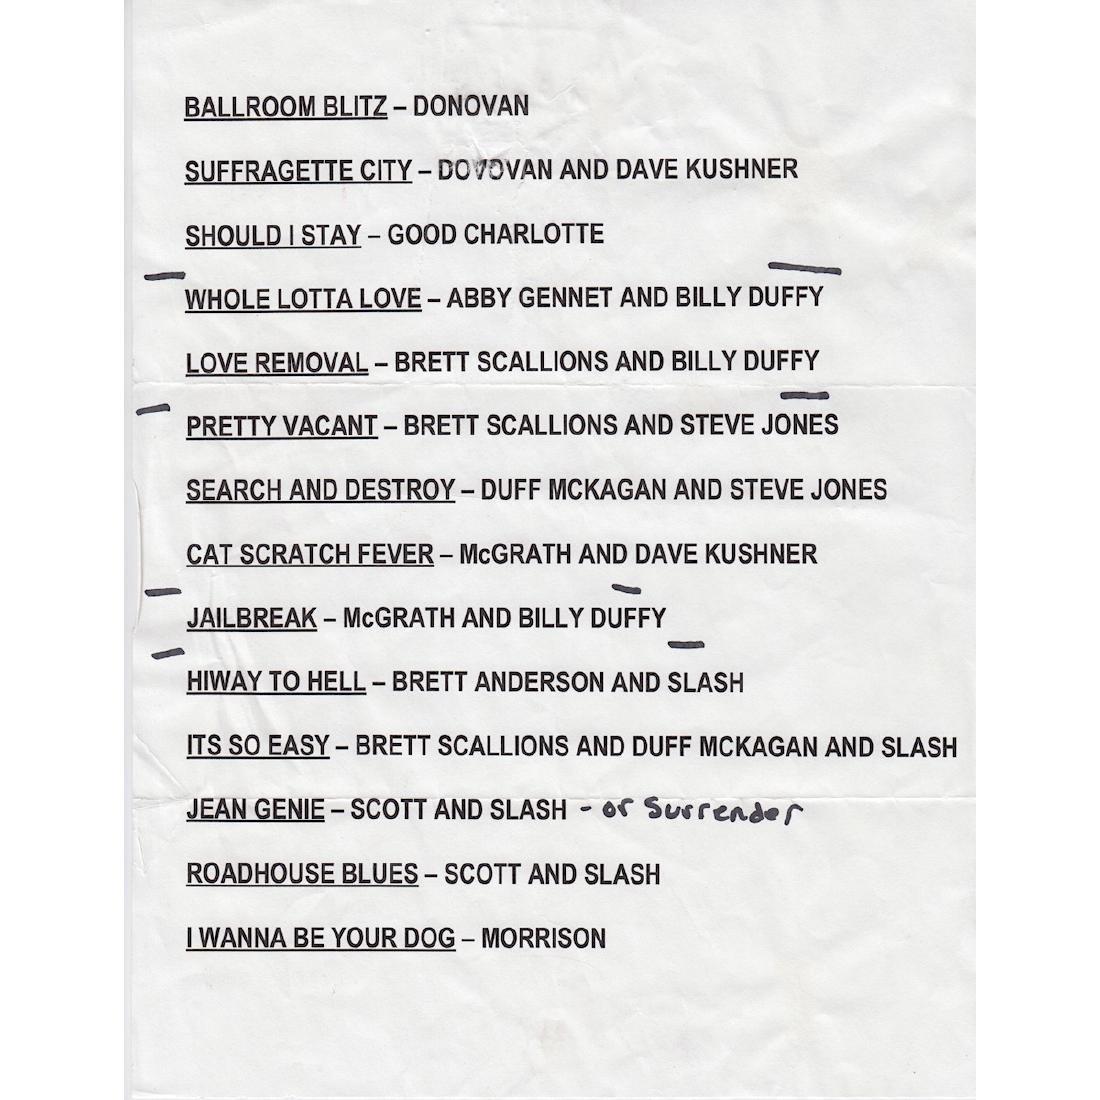 Guns N' Roses - Camp Freddy - 2005 Setlist